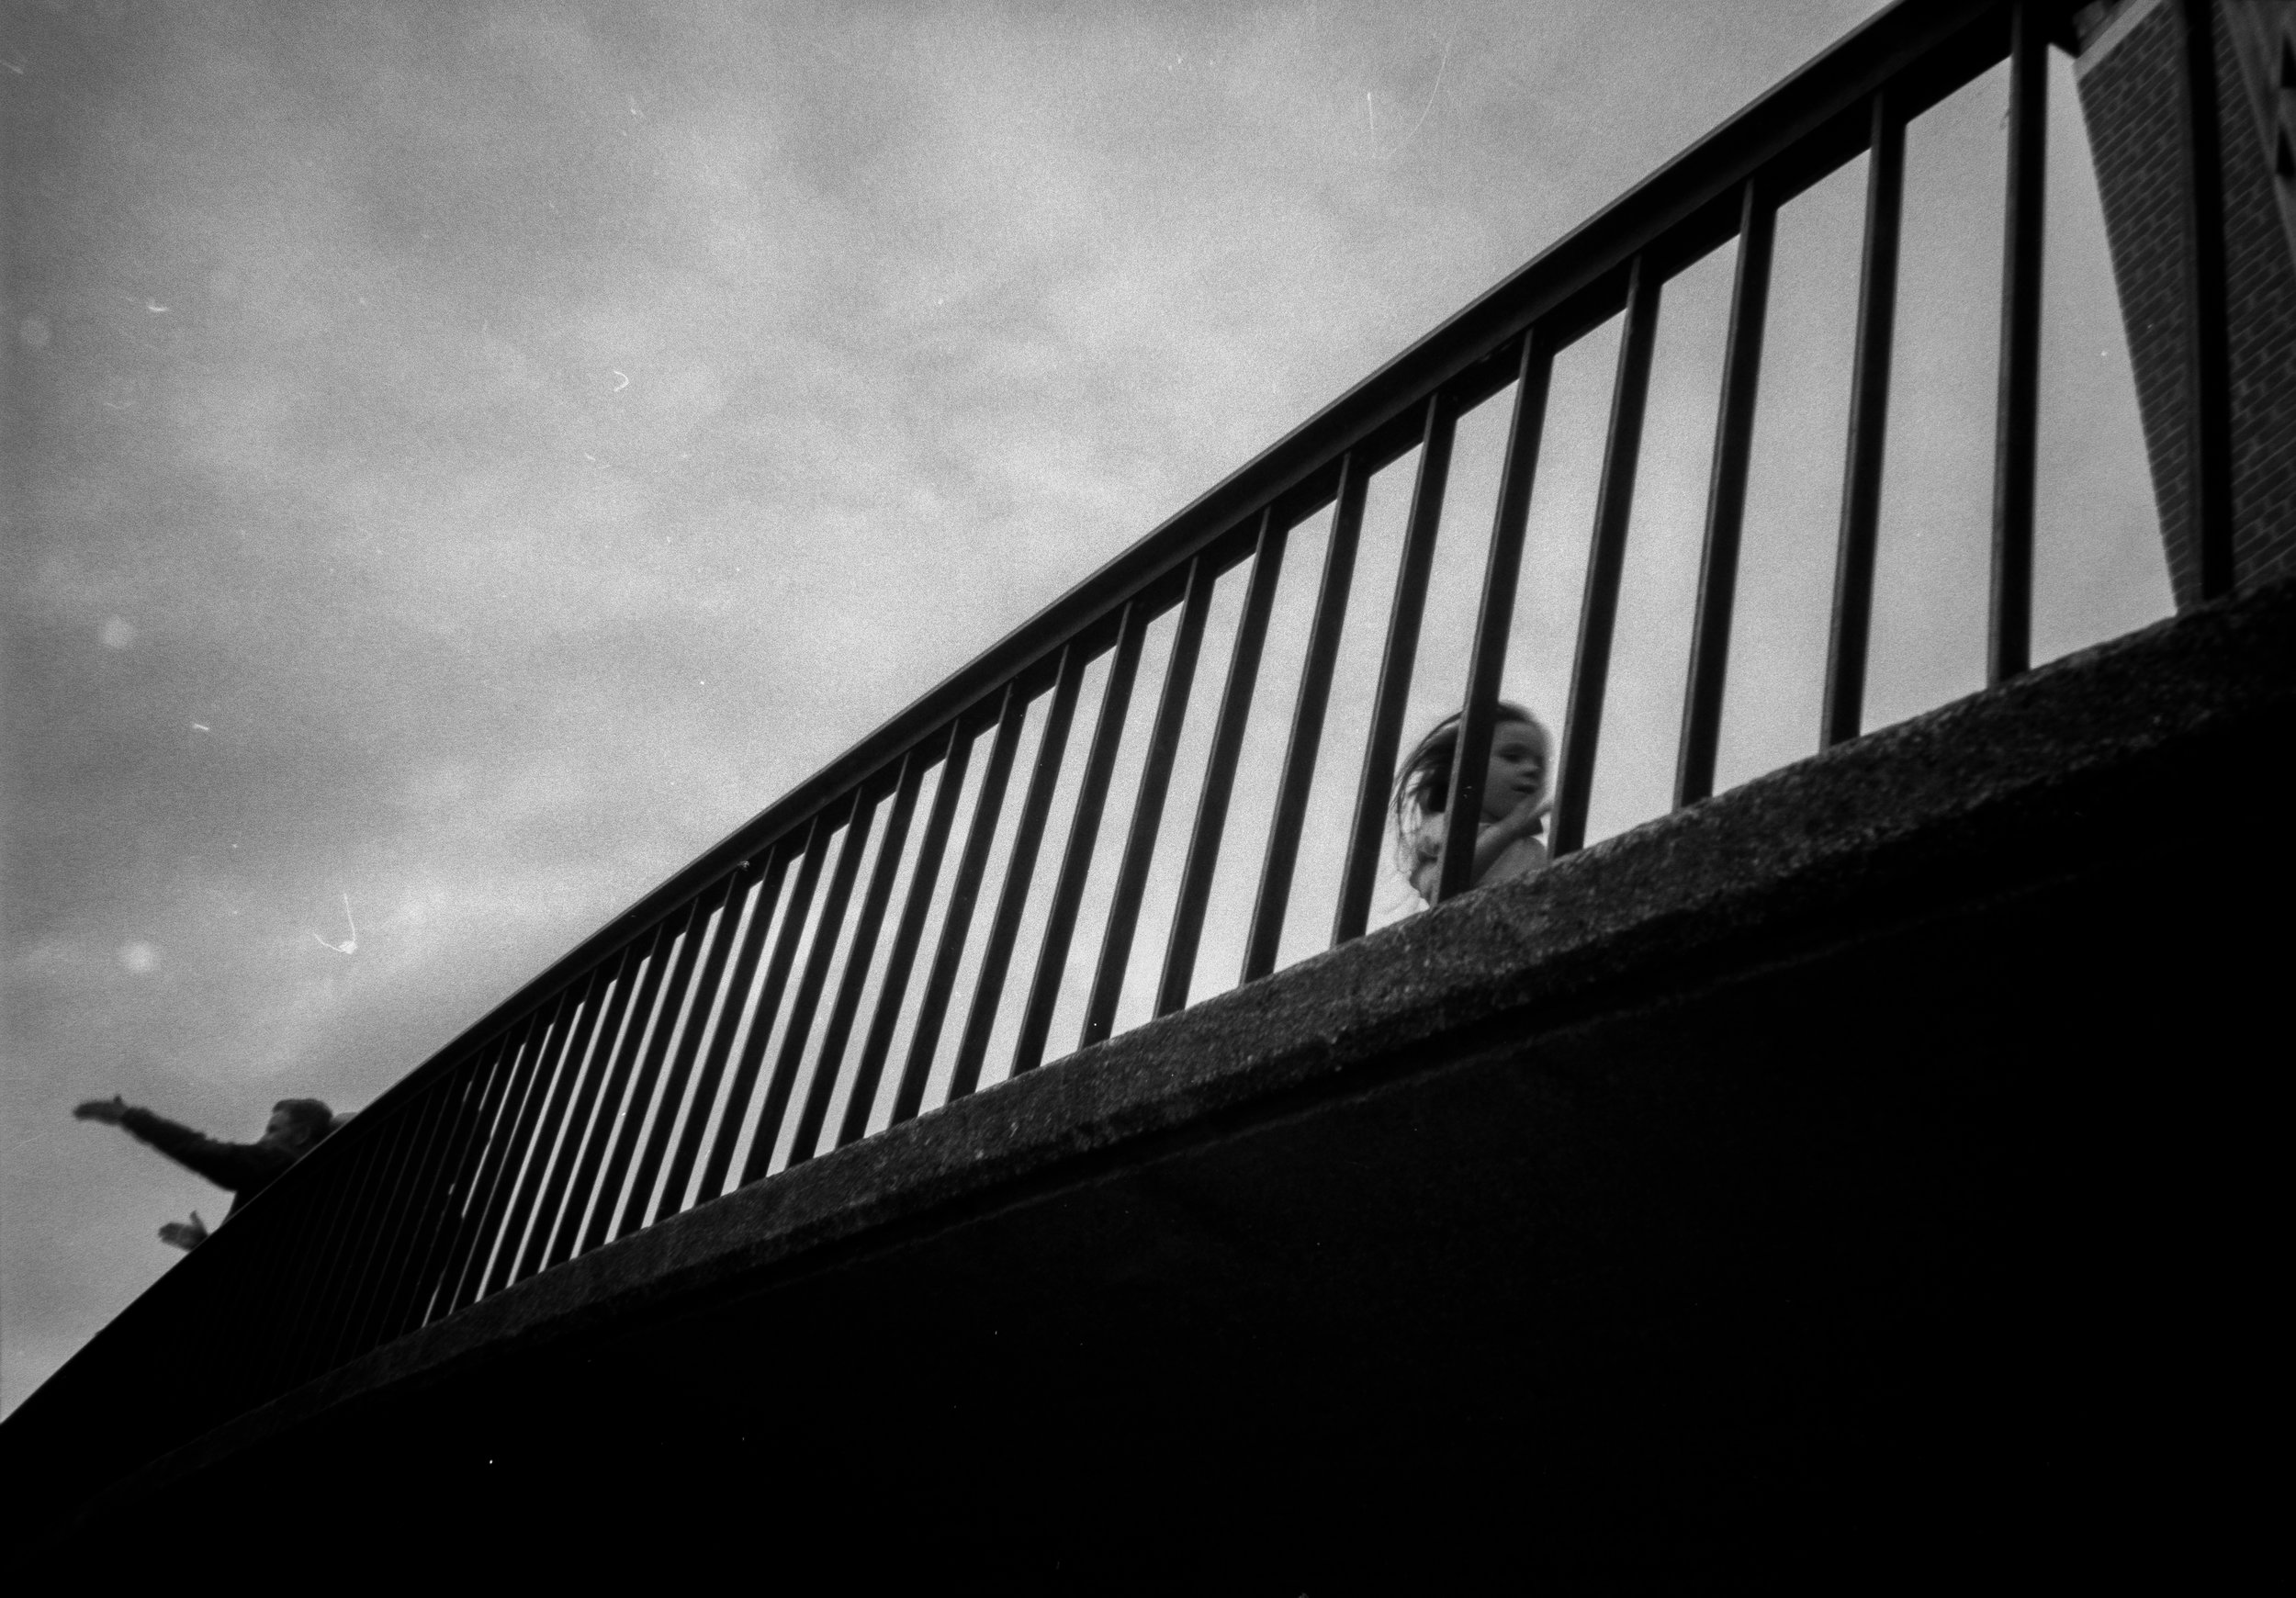 cambridge35mm-8332.jpg